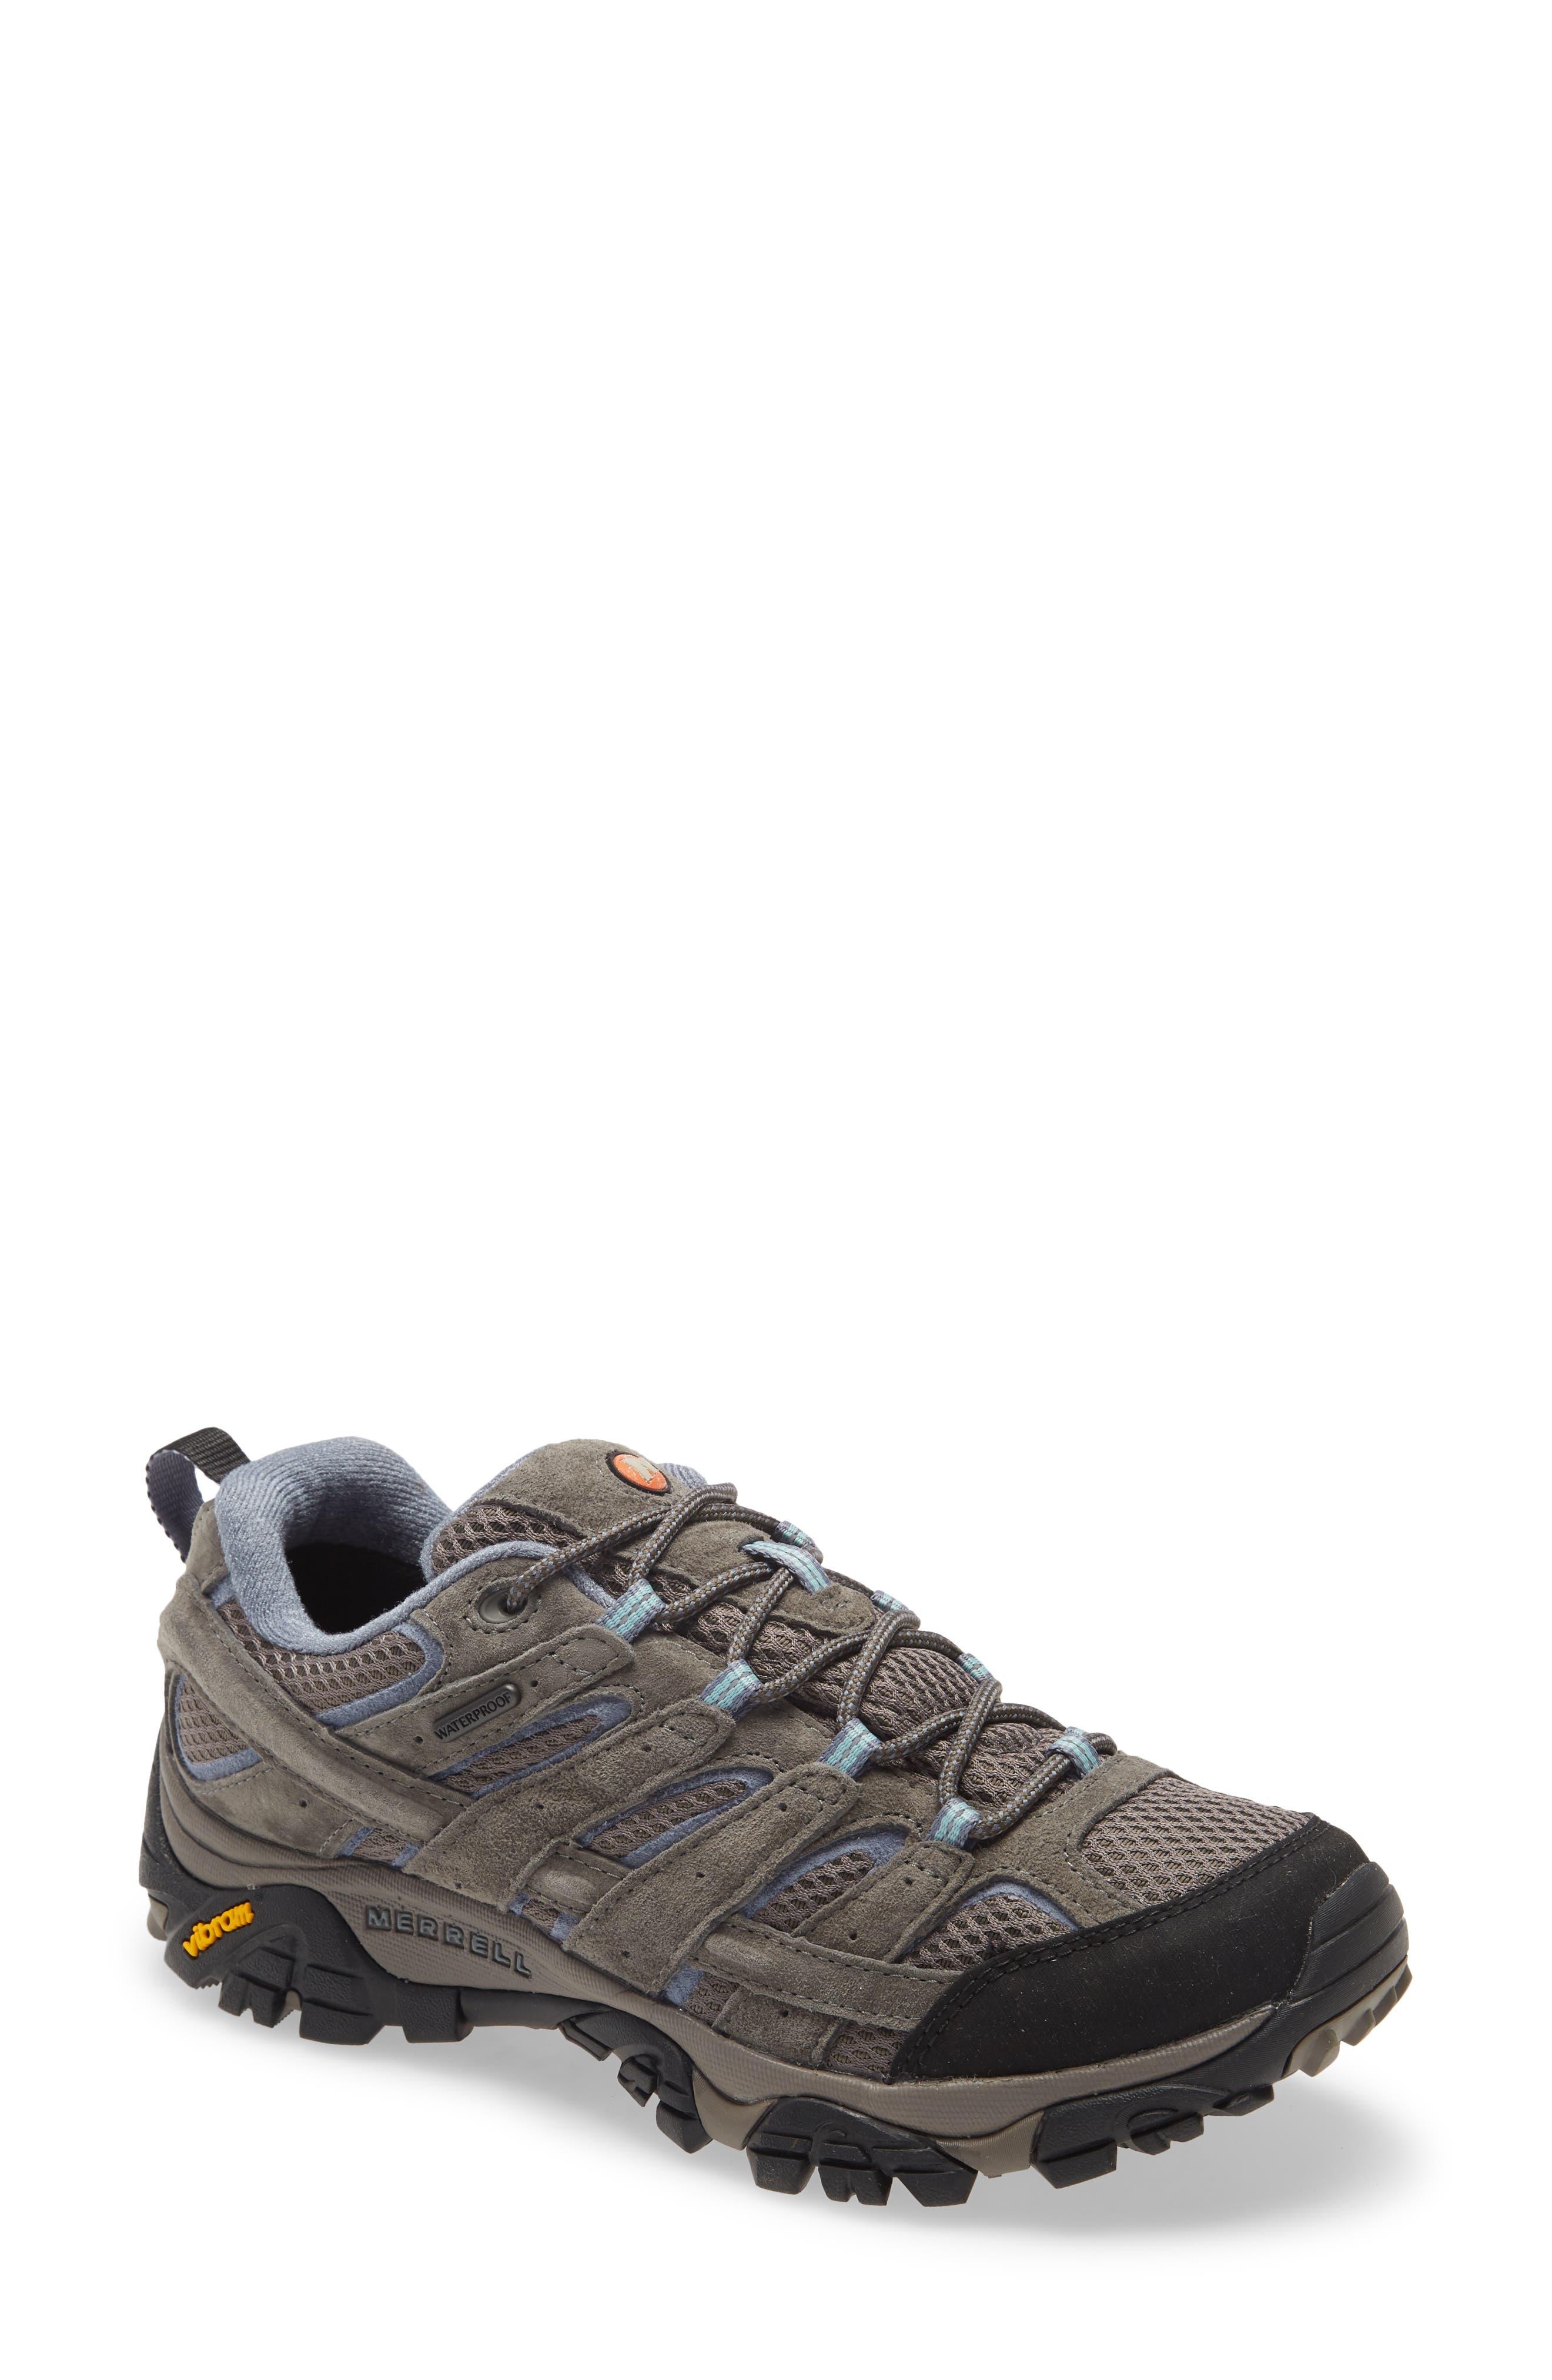 Moab 2 Waterproof Hiking Shoe